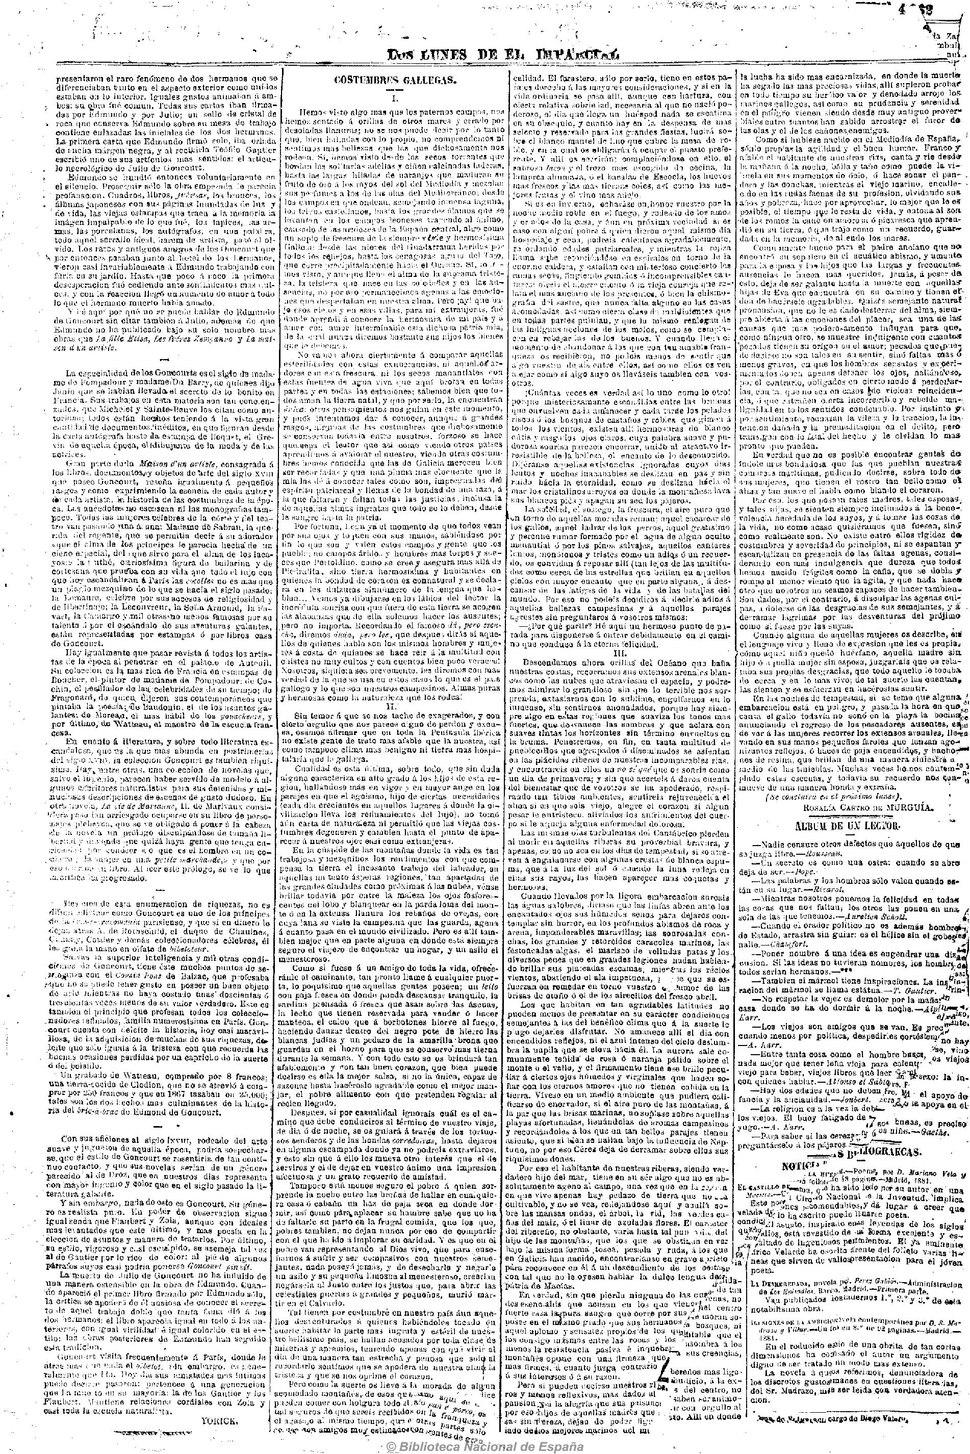 El Imparcial. Madrid. 28.3.1881.pdf&page=4